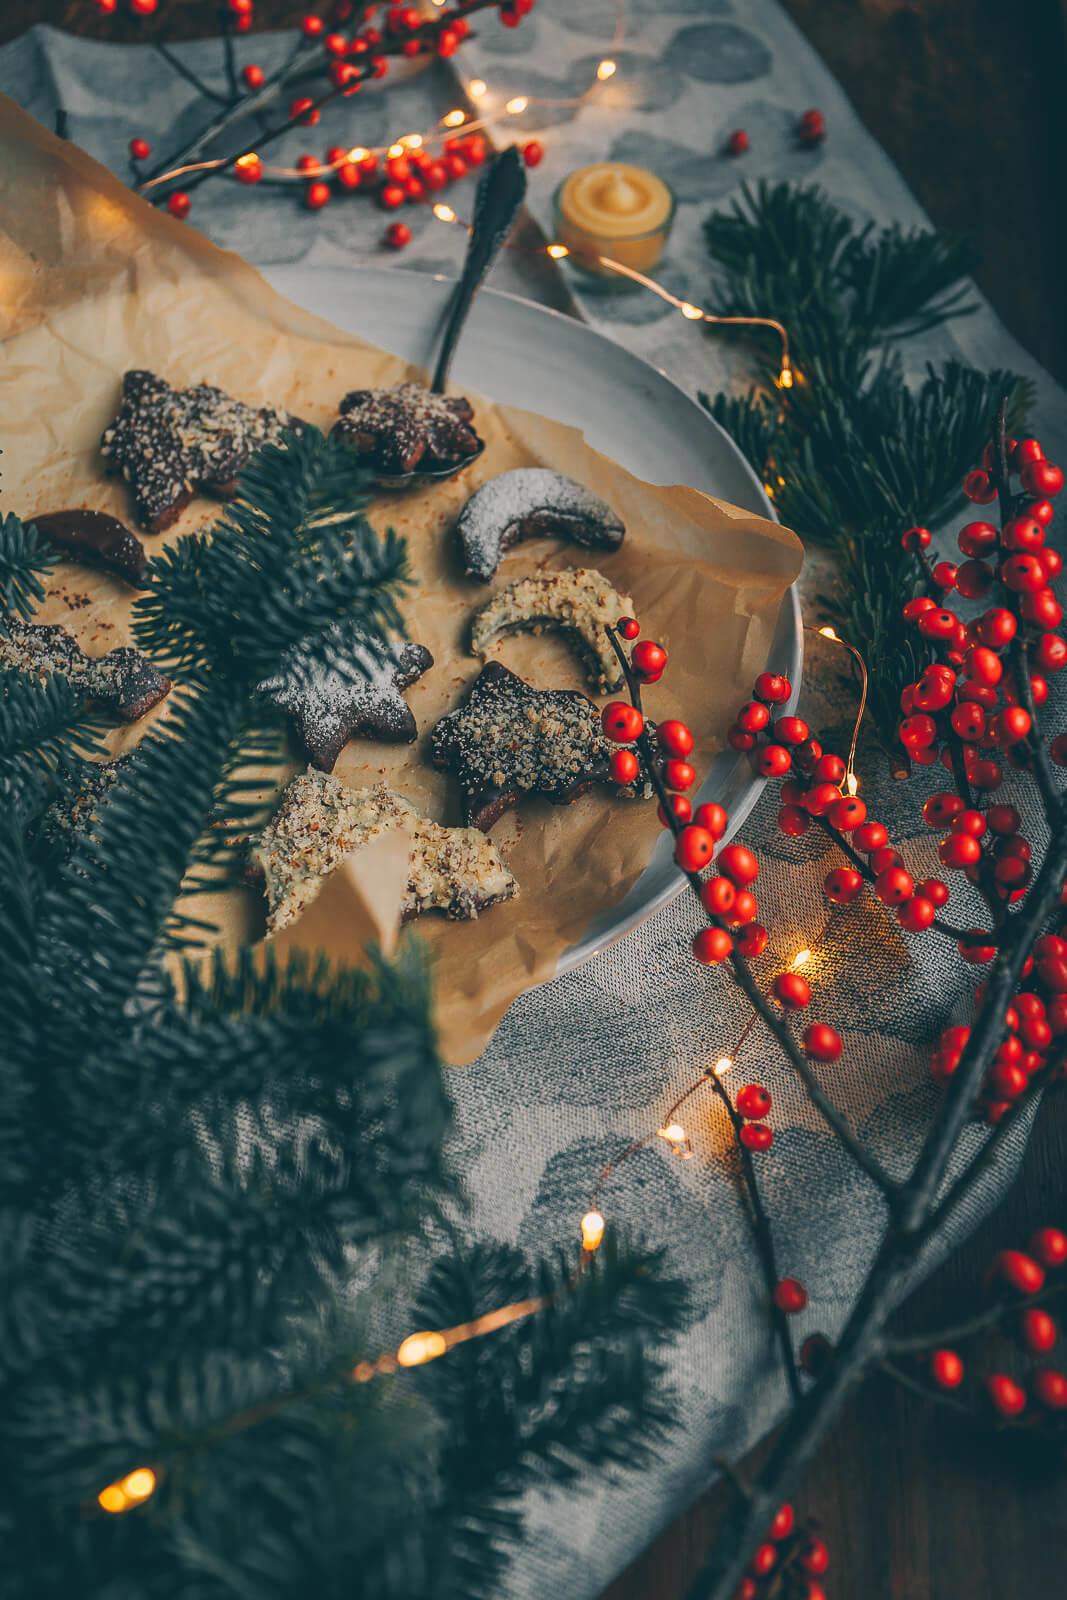 Schoko-Kekse, Schokoladenkekse vegan, vegane Kekse, vegane Weihnachtskekse, vegane Kekse ausstechen, vegane Cookies, vegane Ausstechkekse, vegane Plätzchen, Schoko Plätzchen vegan